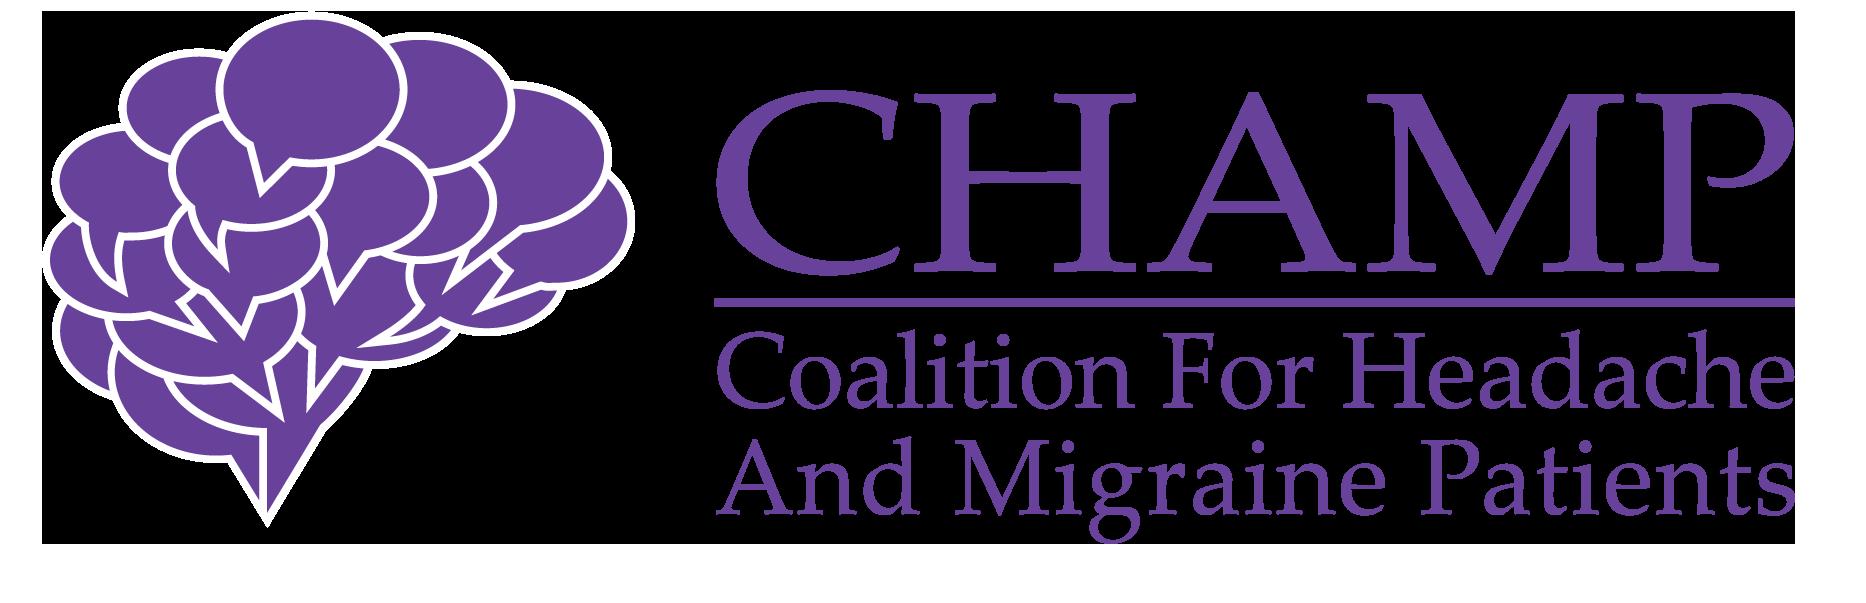 CHAMP Logo 3.png